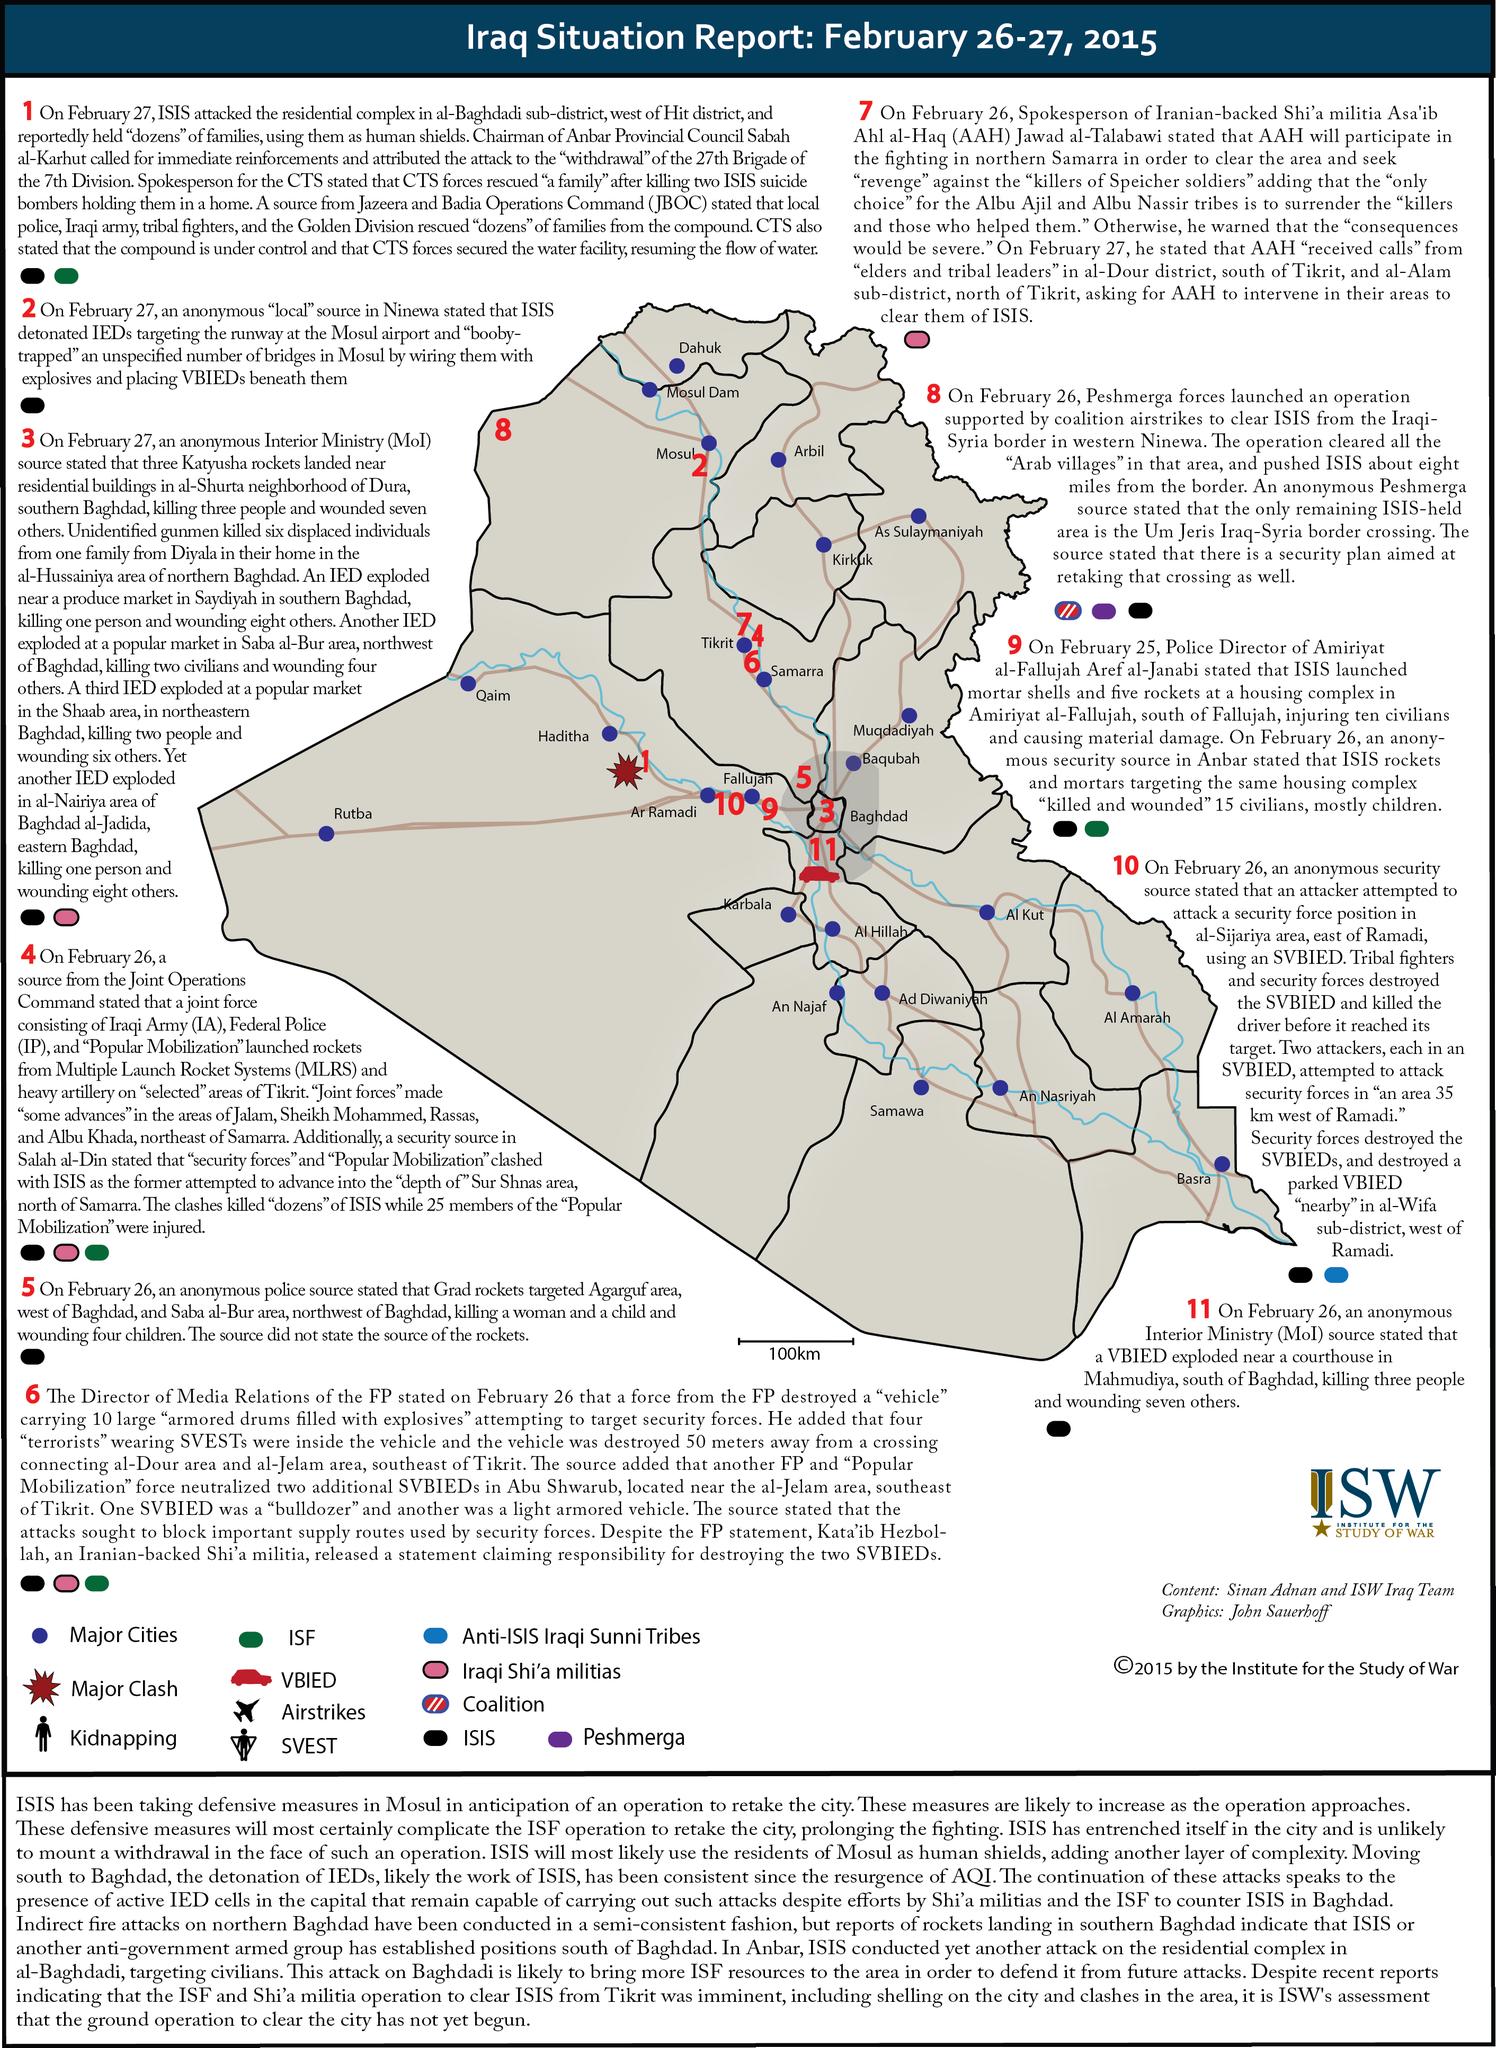 Début de révolte en Irak? - Page 6 B-4-ecWU8AARLCj